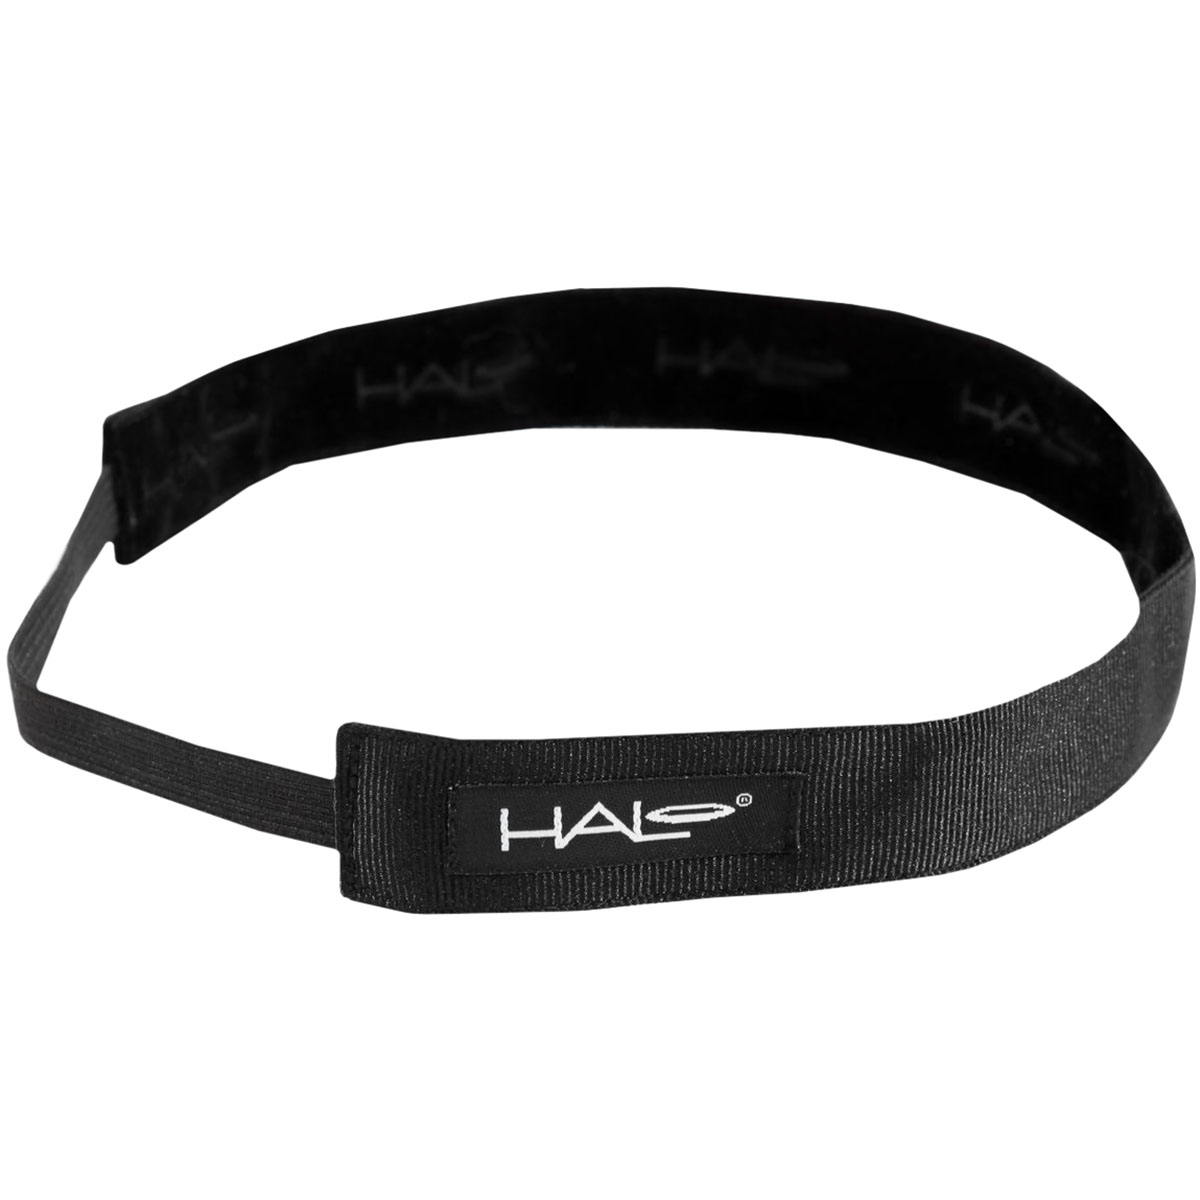 "Halo Headband 1"" Wide Hairband - Black"